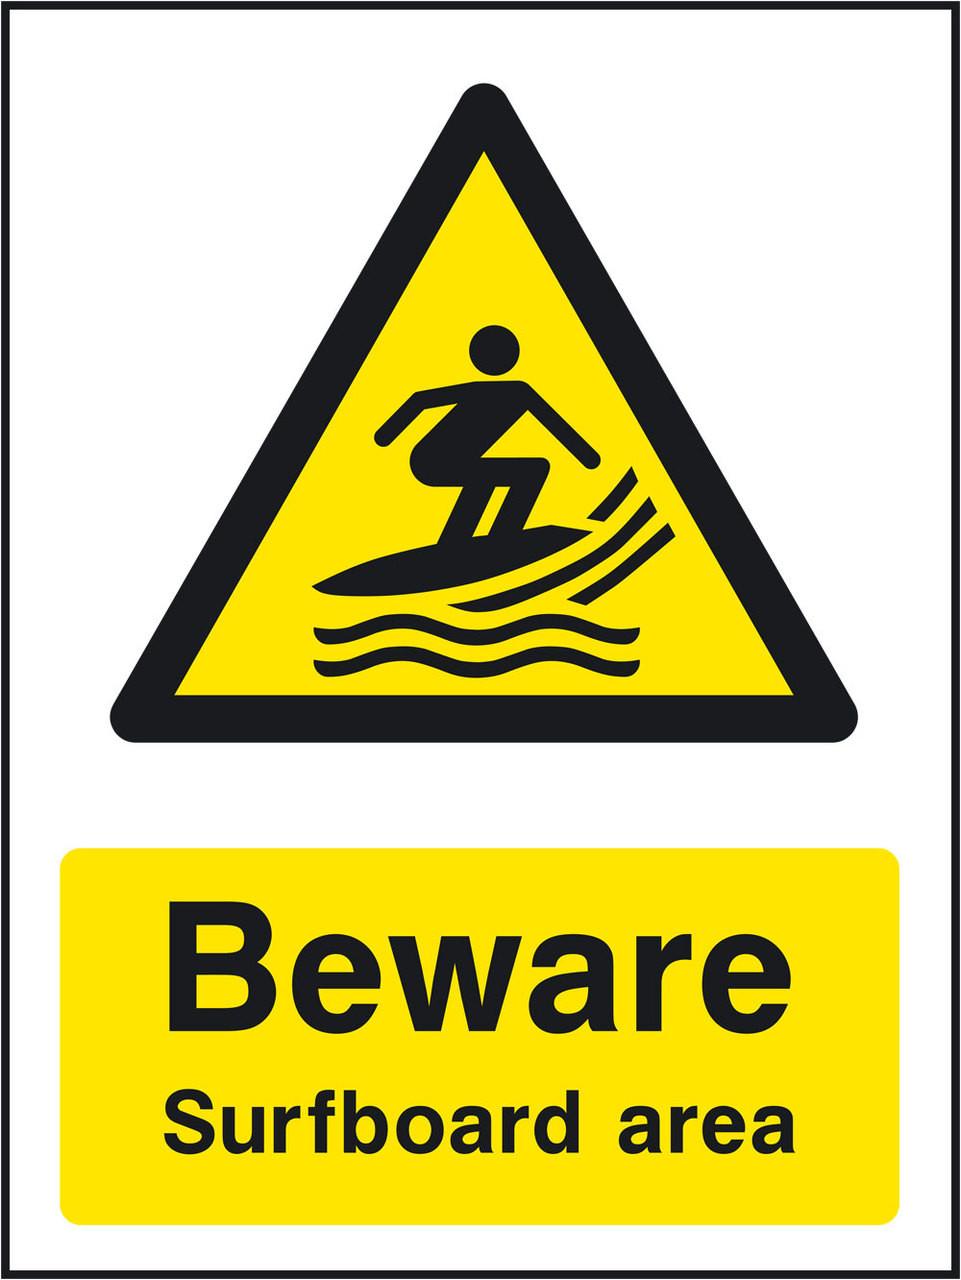 Beware surfboard area